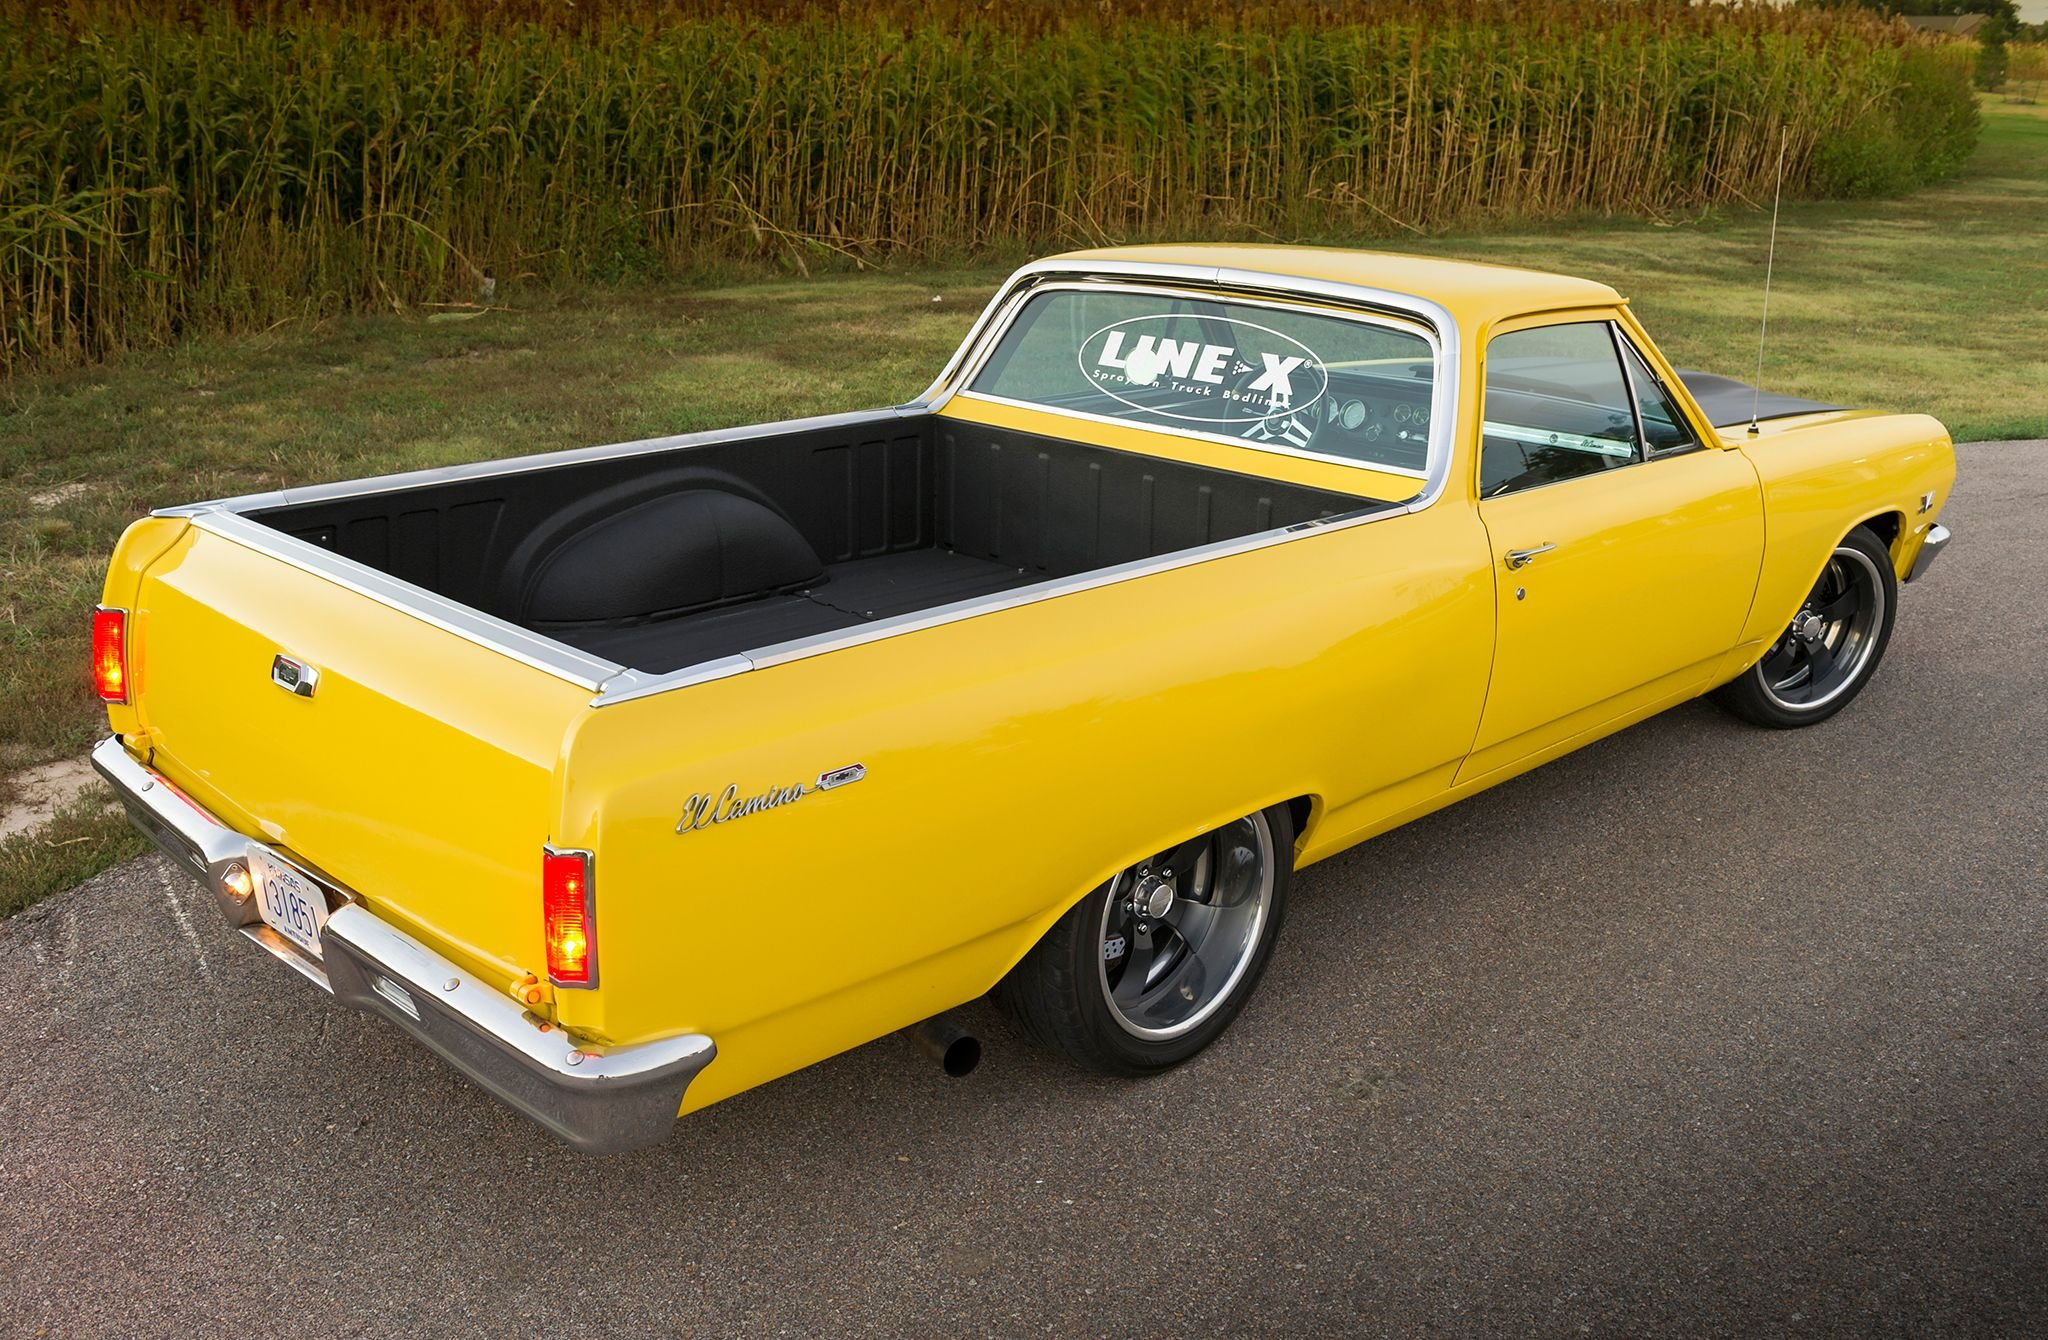 1965 Chevrolet El Camino-03 wallpaper